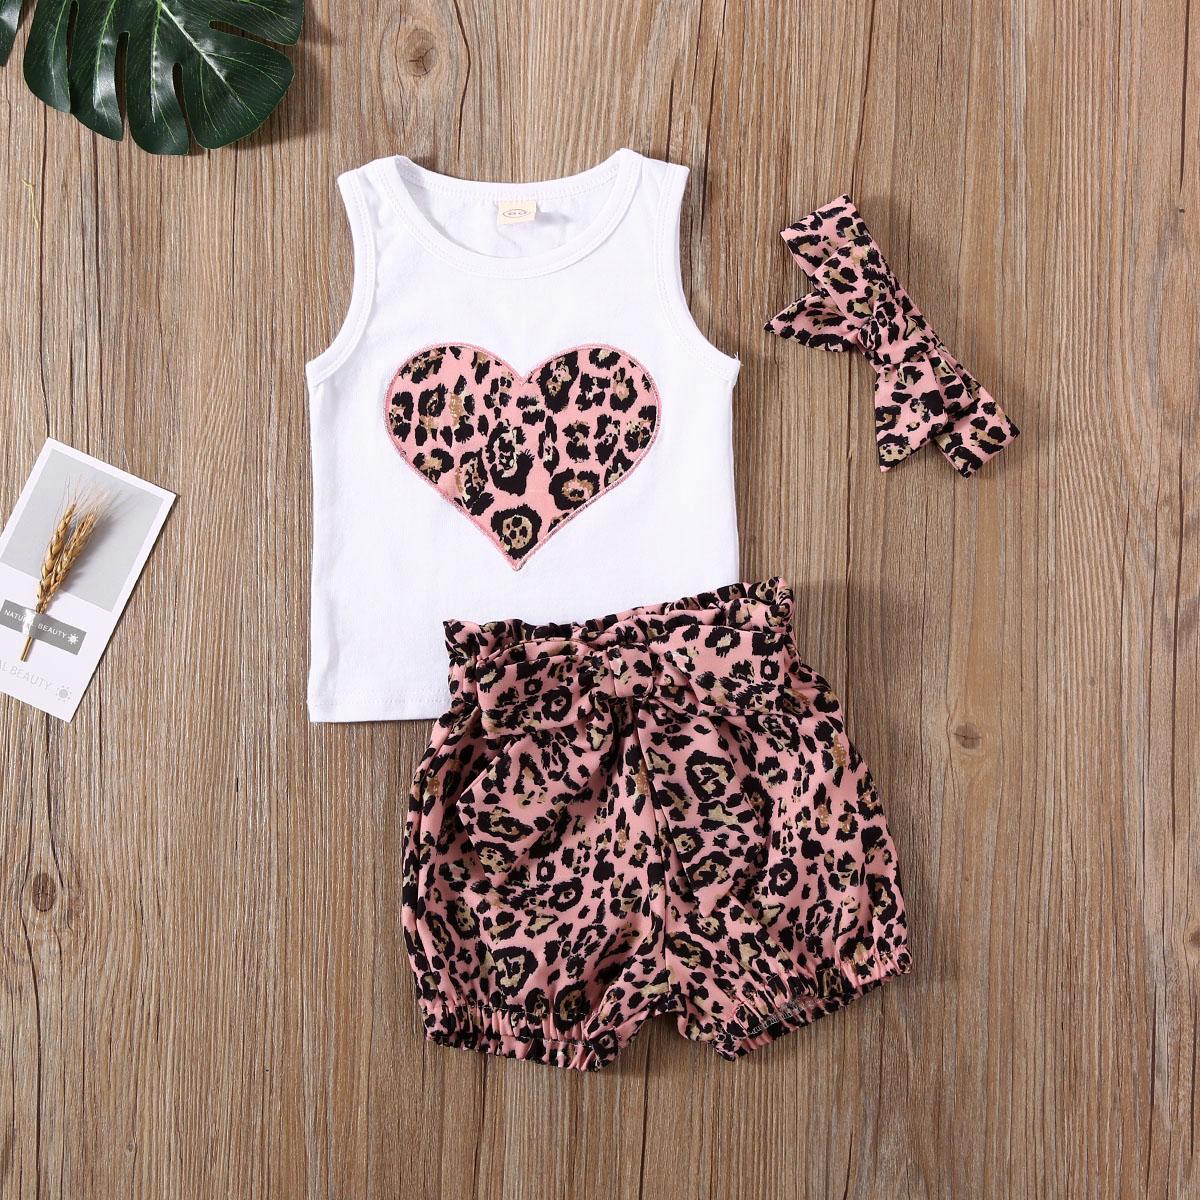 Emmababy Newborn Baby Girl Clothes Summer Leopard Print Peach Heart Sleeveless Tops Short Pants Headband 3Pcs Outfits Sunsuit